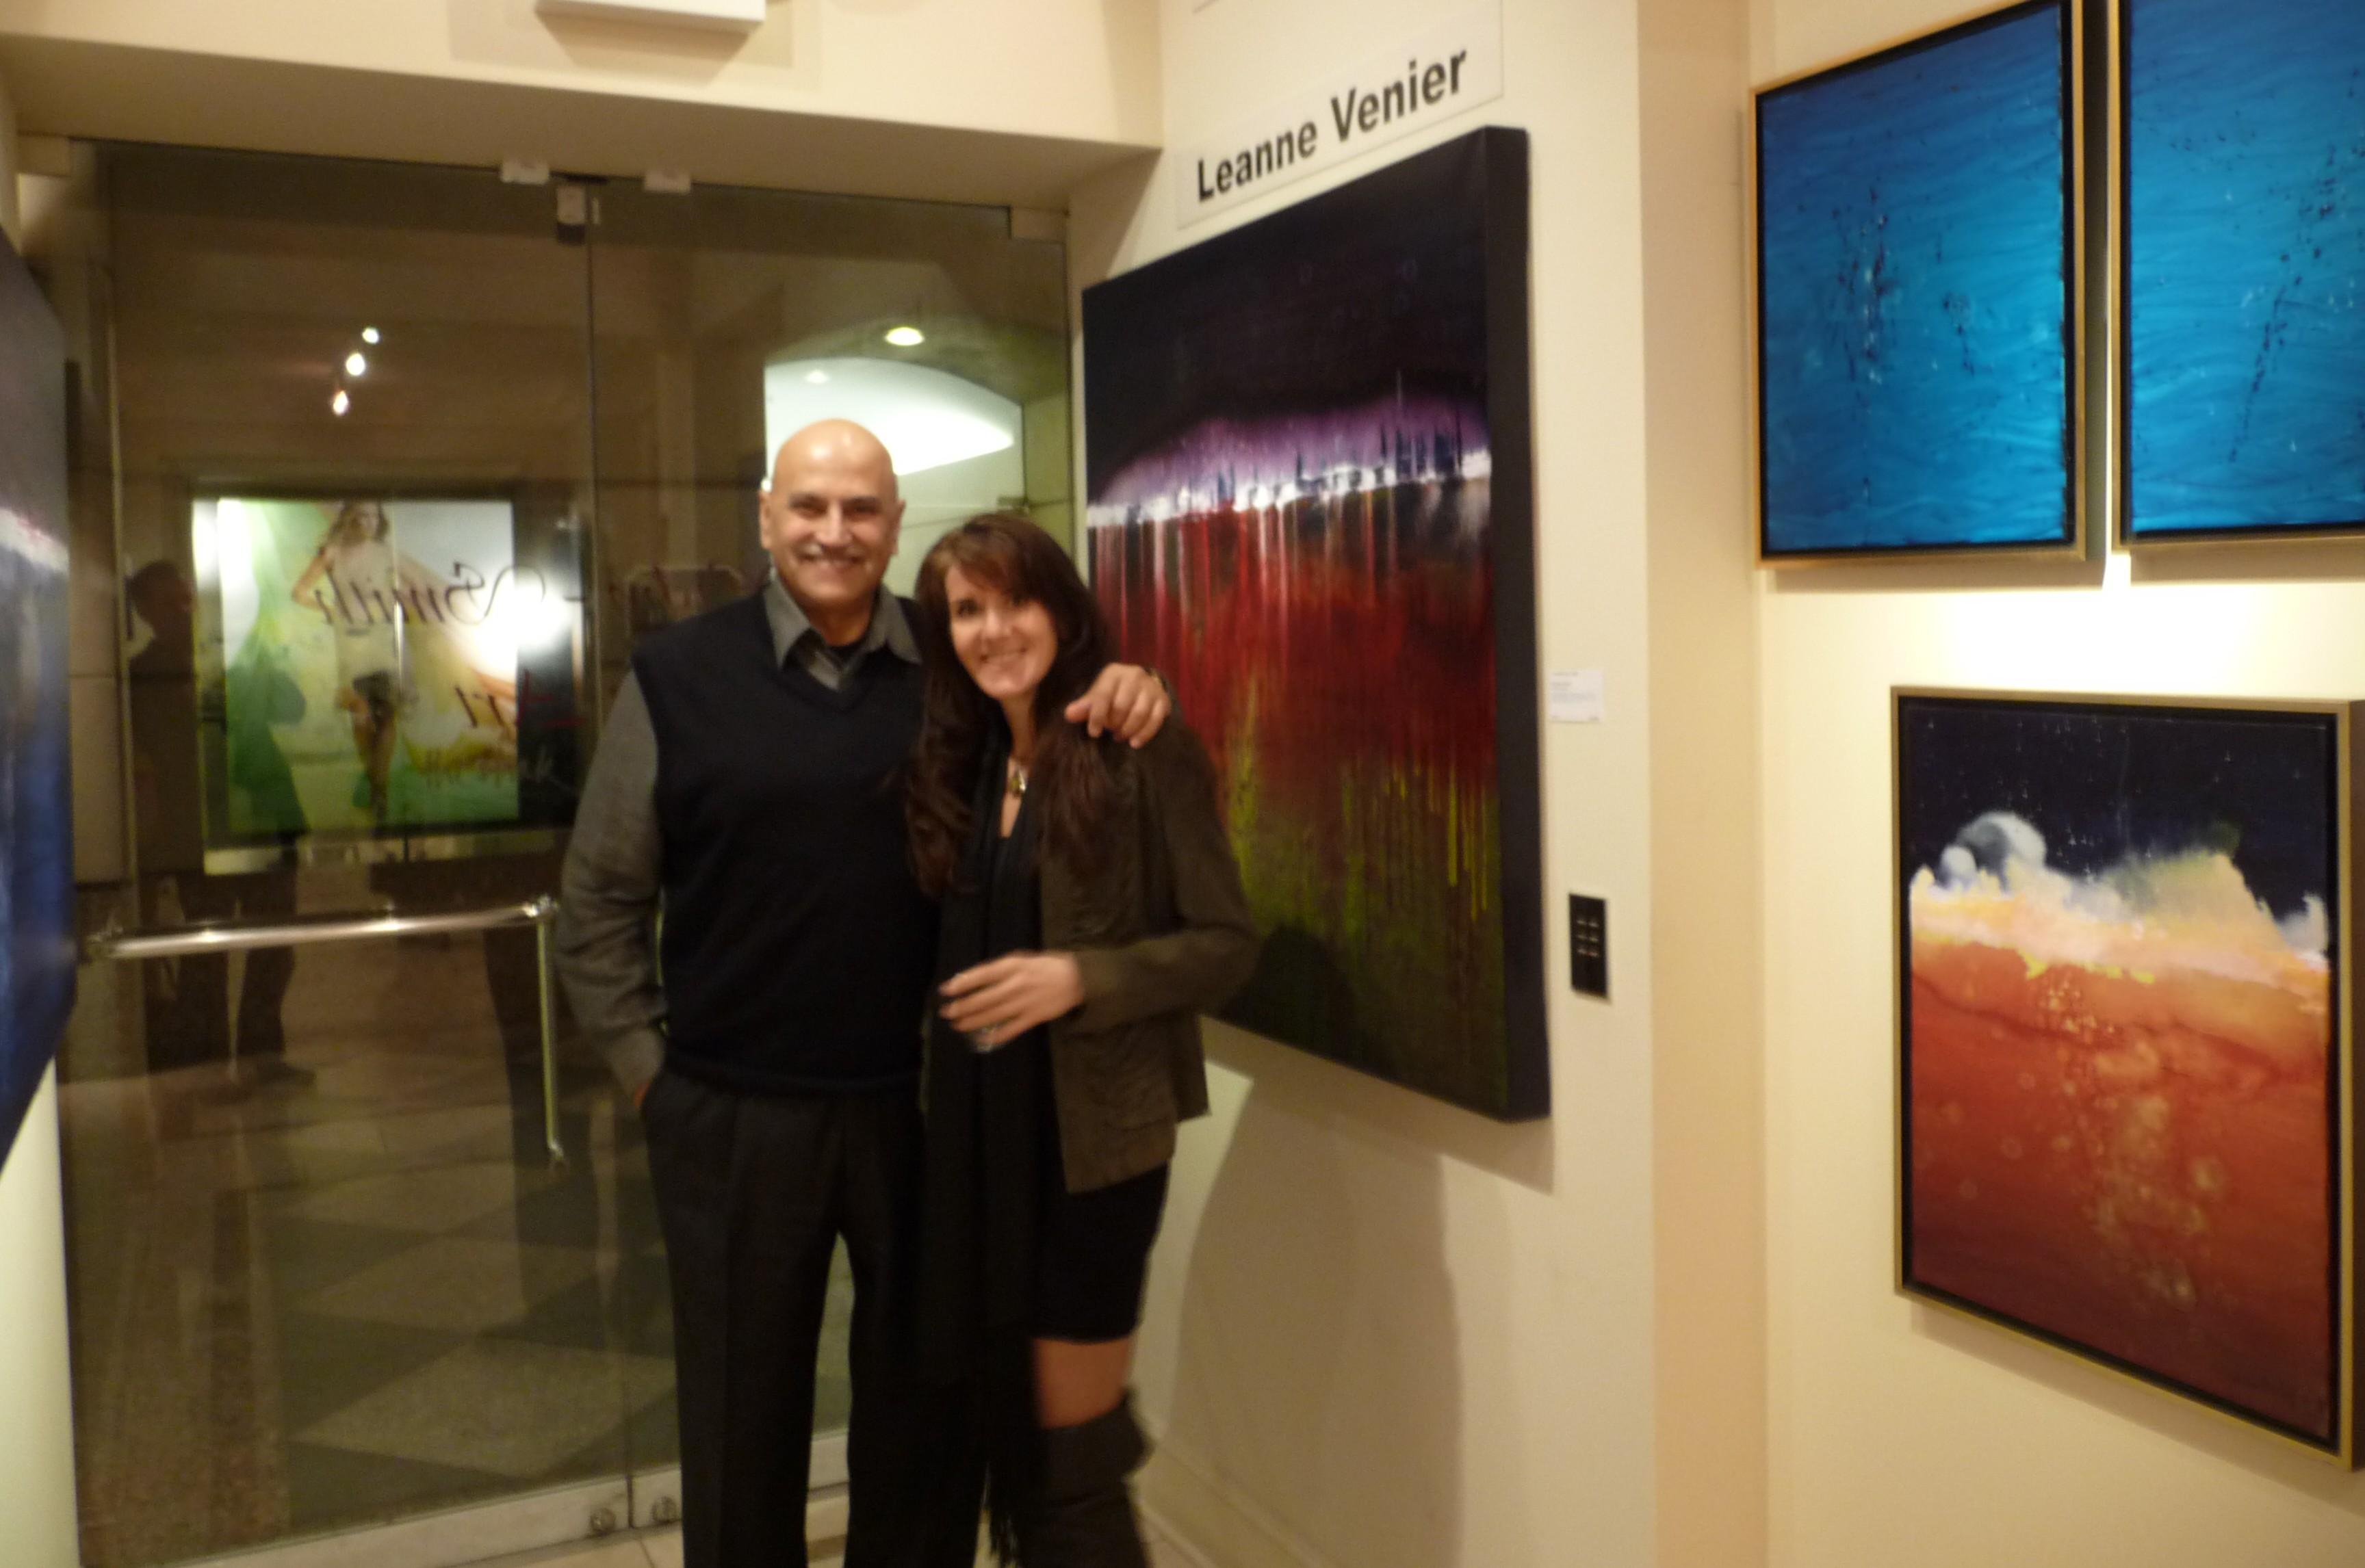 Leanne Venier with Wisby Smith Gallery owner, Nim Vaswani